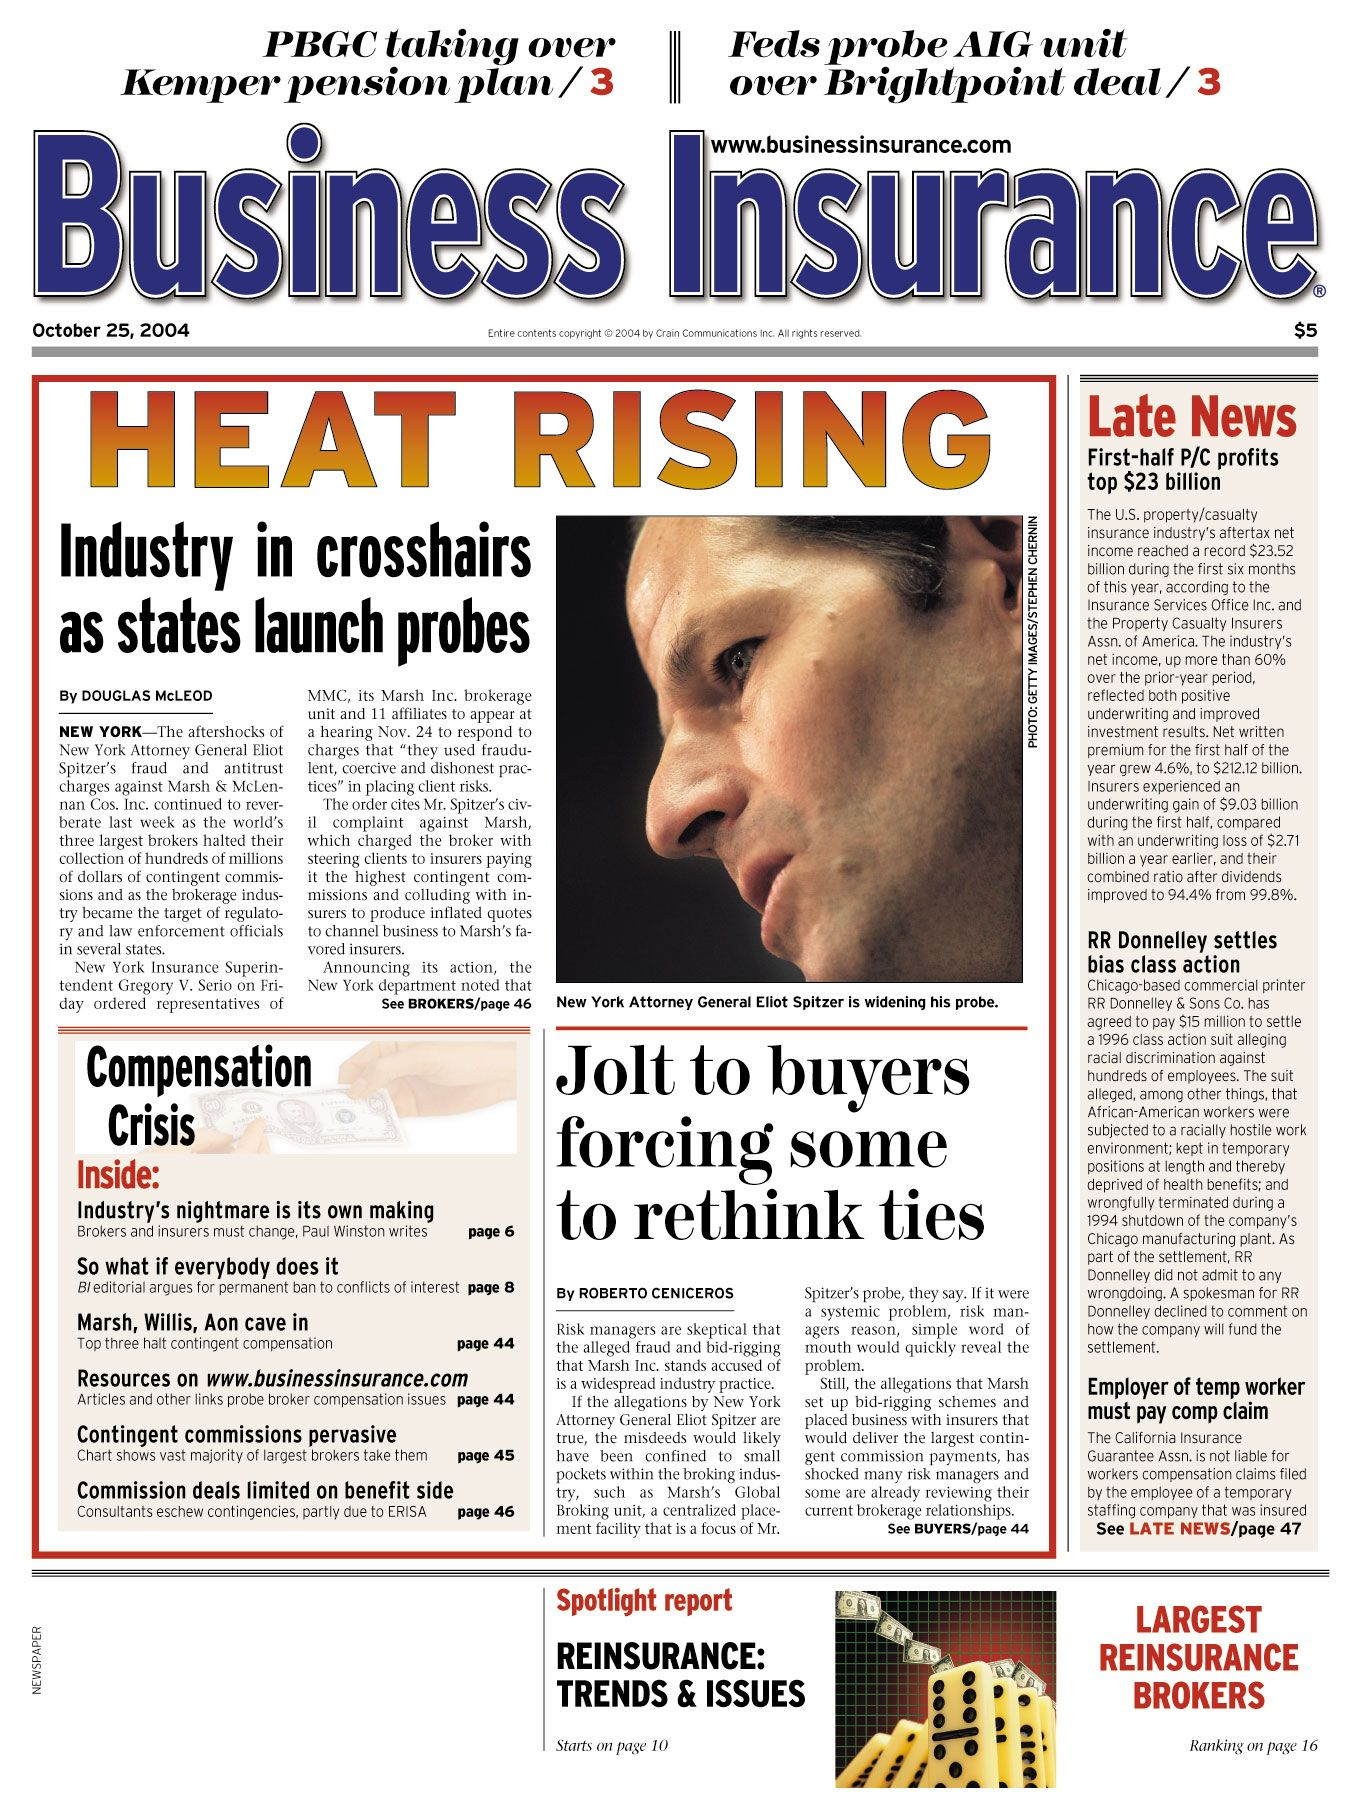 HomeOwnersInsuranceFortLauderdale Business Insurance